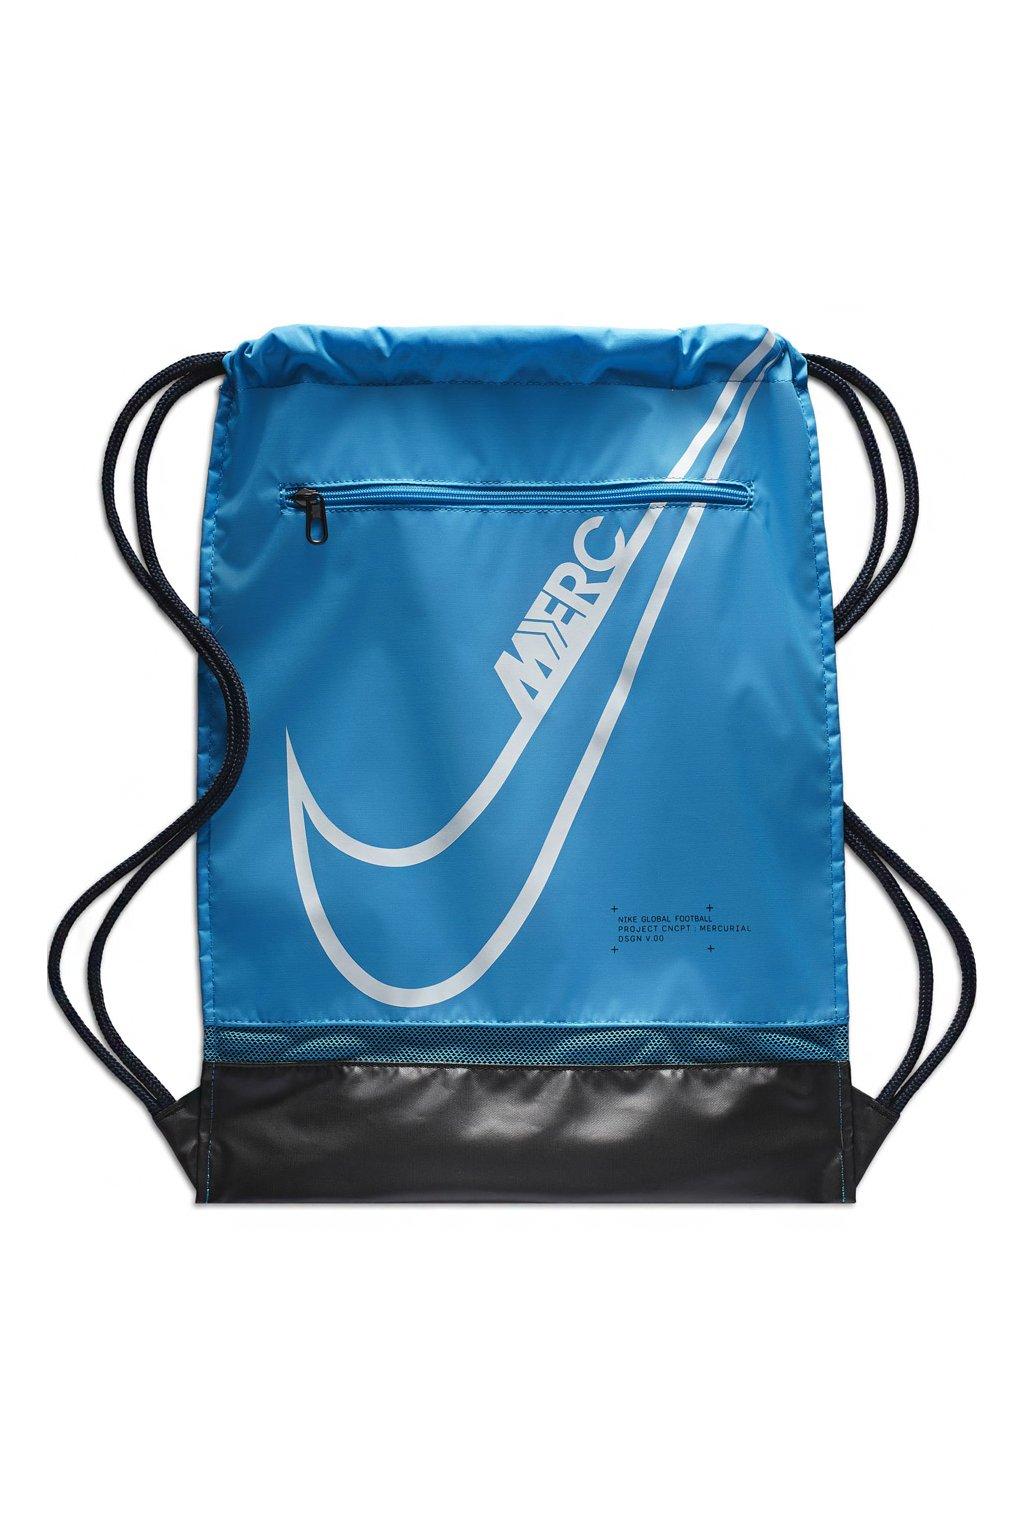 Vak na obuv Nike Mercurial GMSK modrý BA6108 486